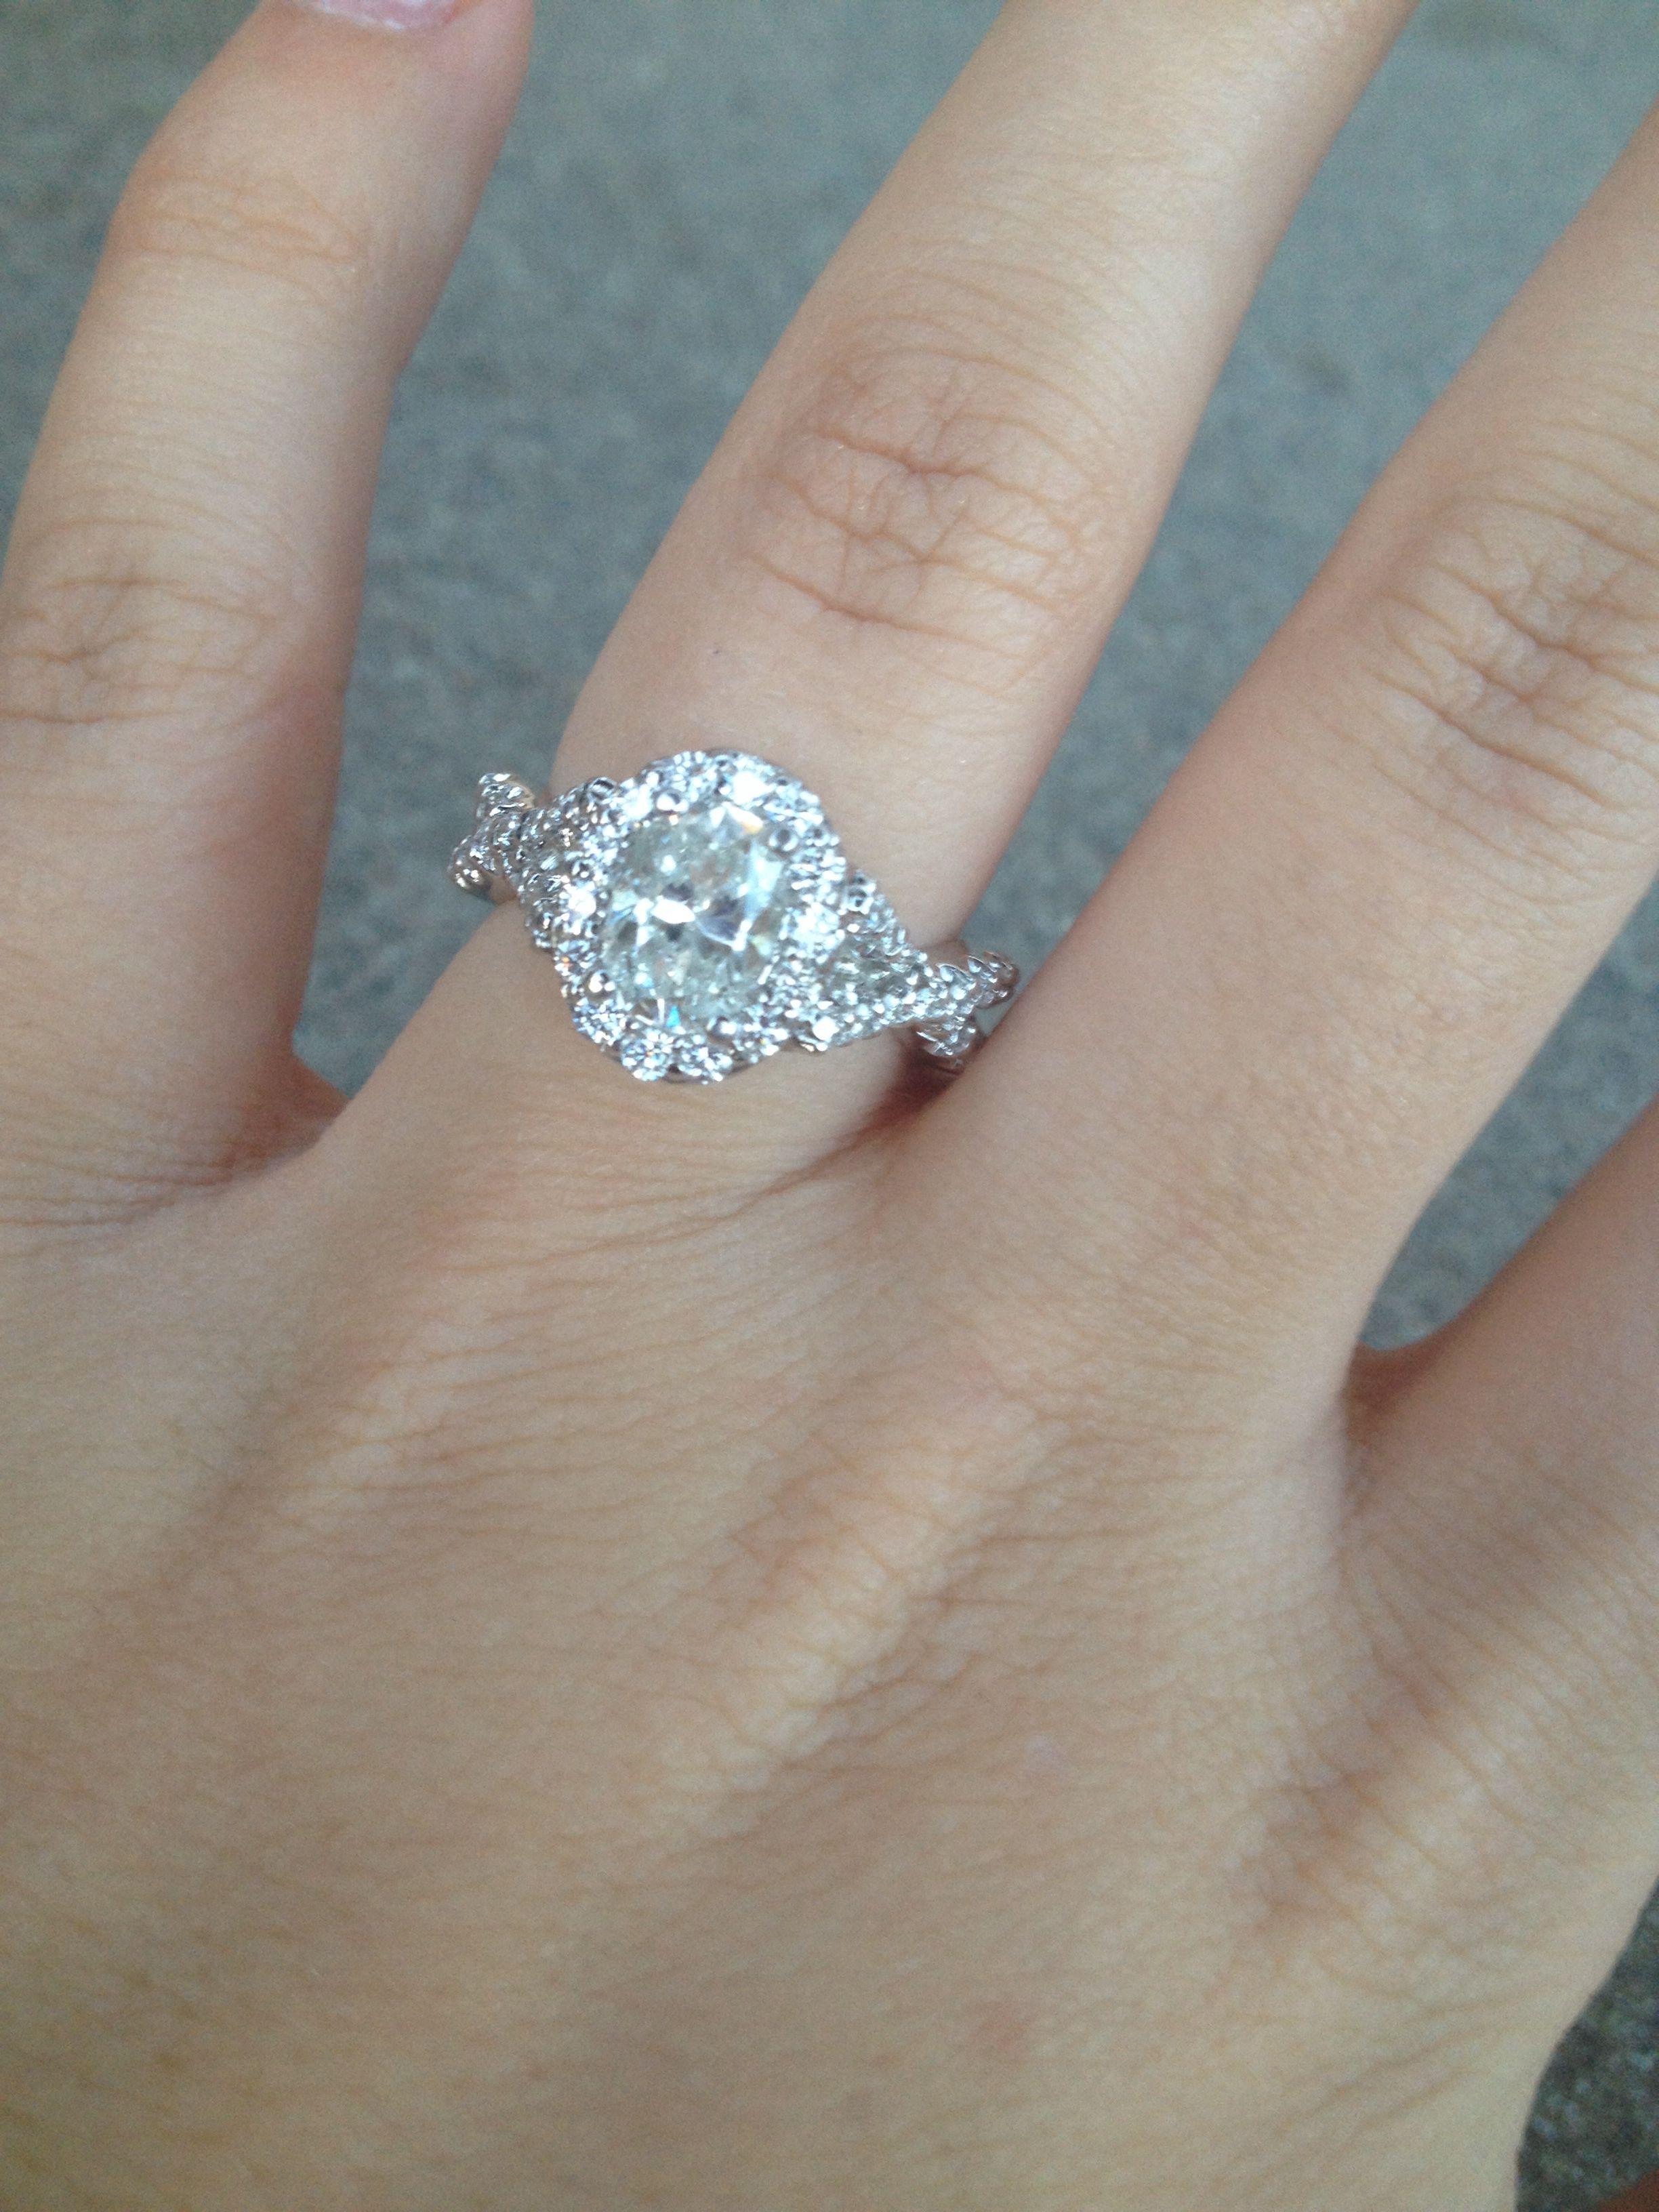 Engagement Ring Custom Design By Bride Jeff White Designs